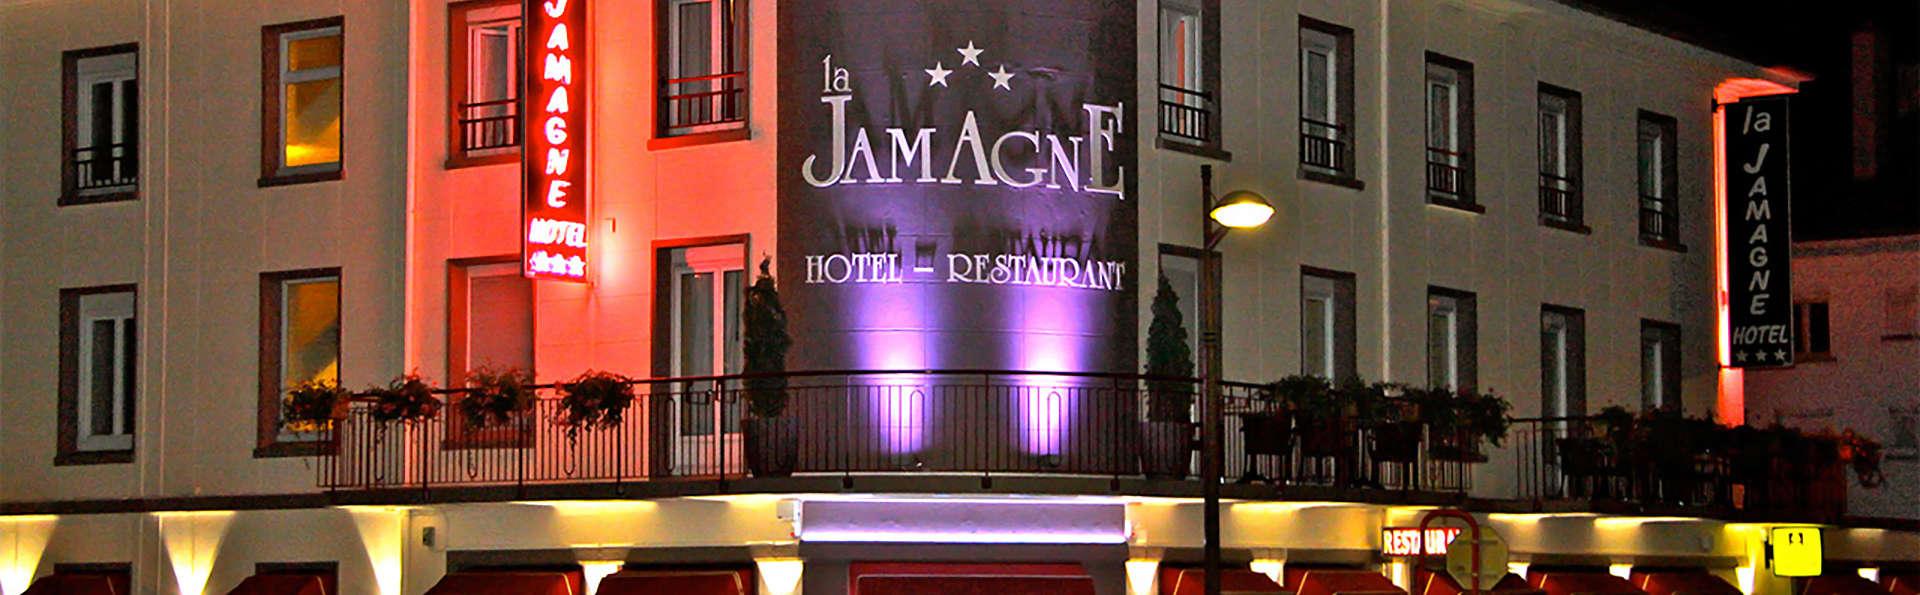 Hotel de la Jamagne & Spa  - Edit_Front2.jpg